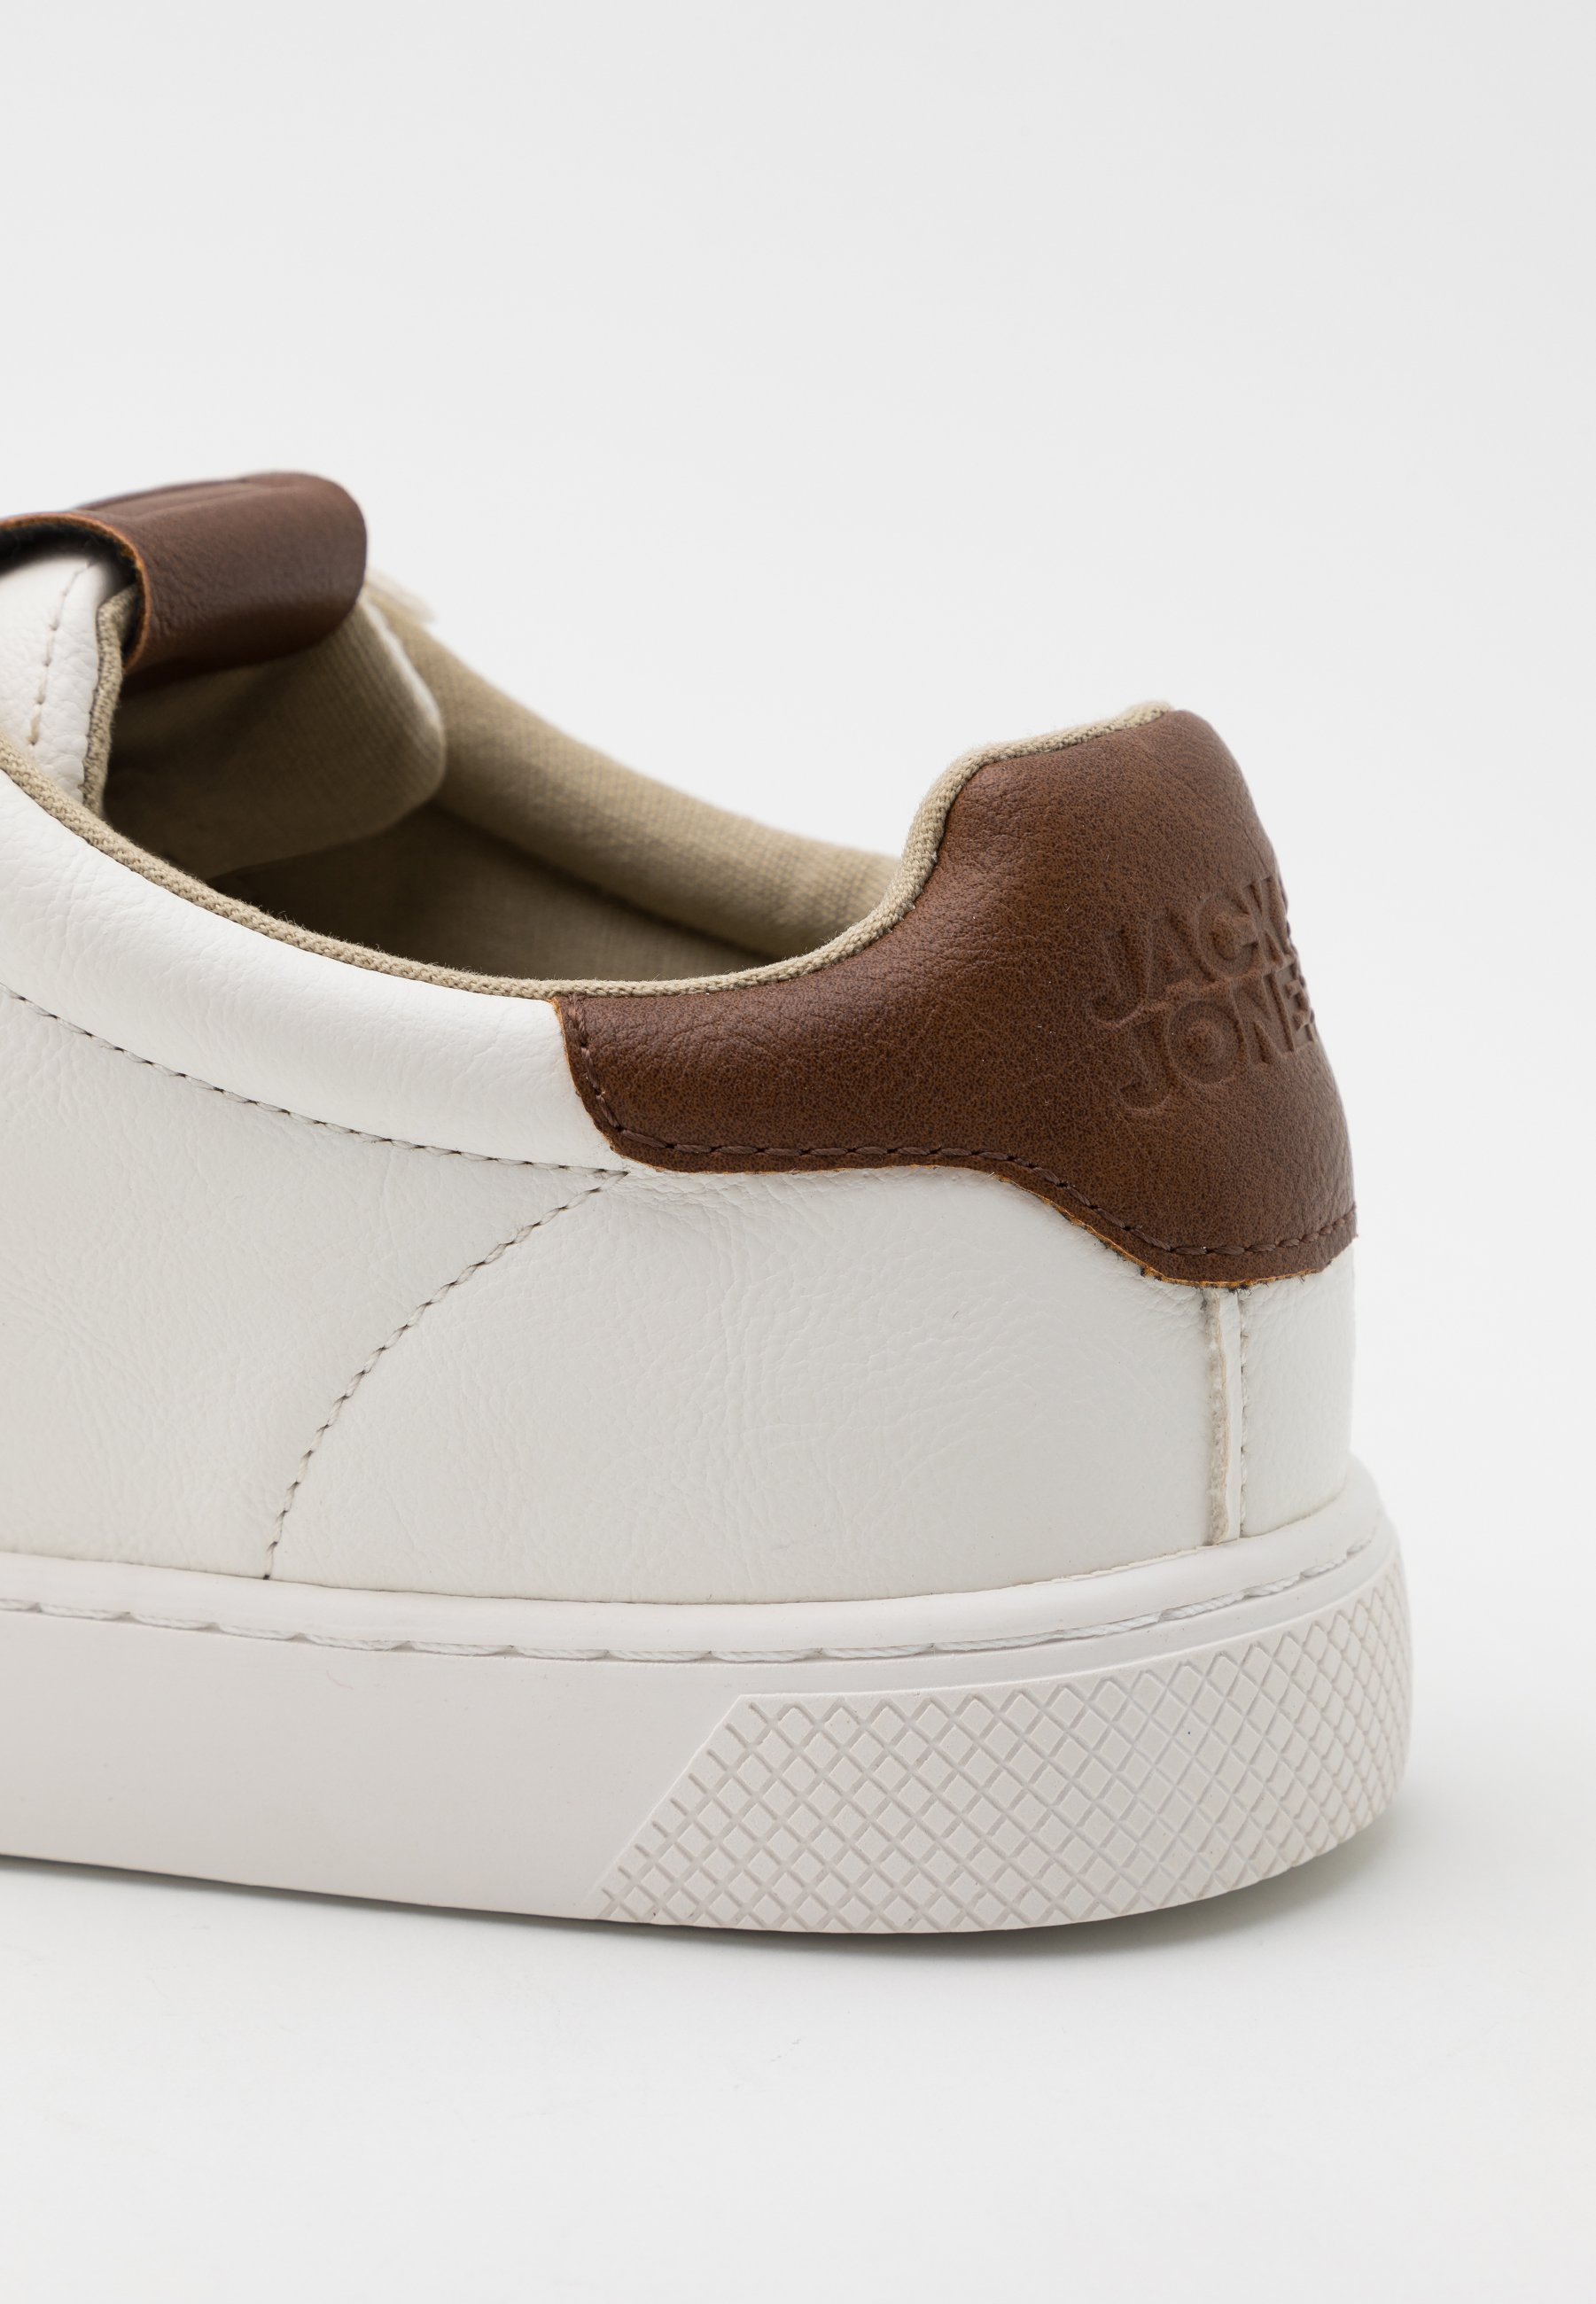 Jack & Jones Jfwlyle - Sneakers Tan